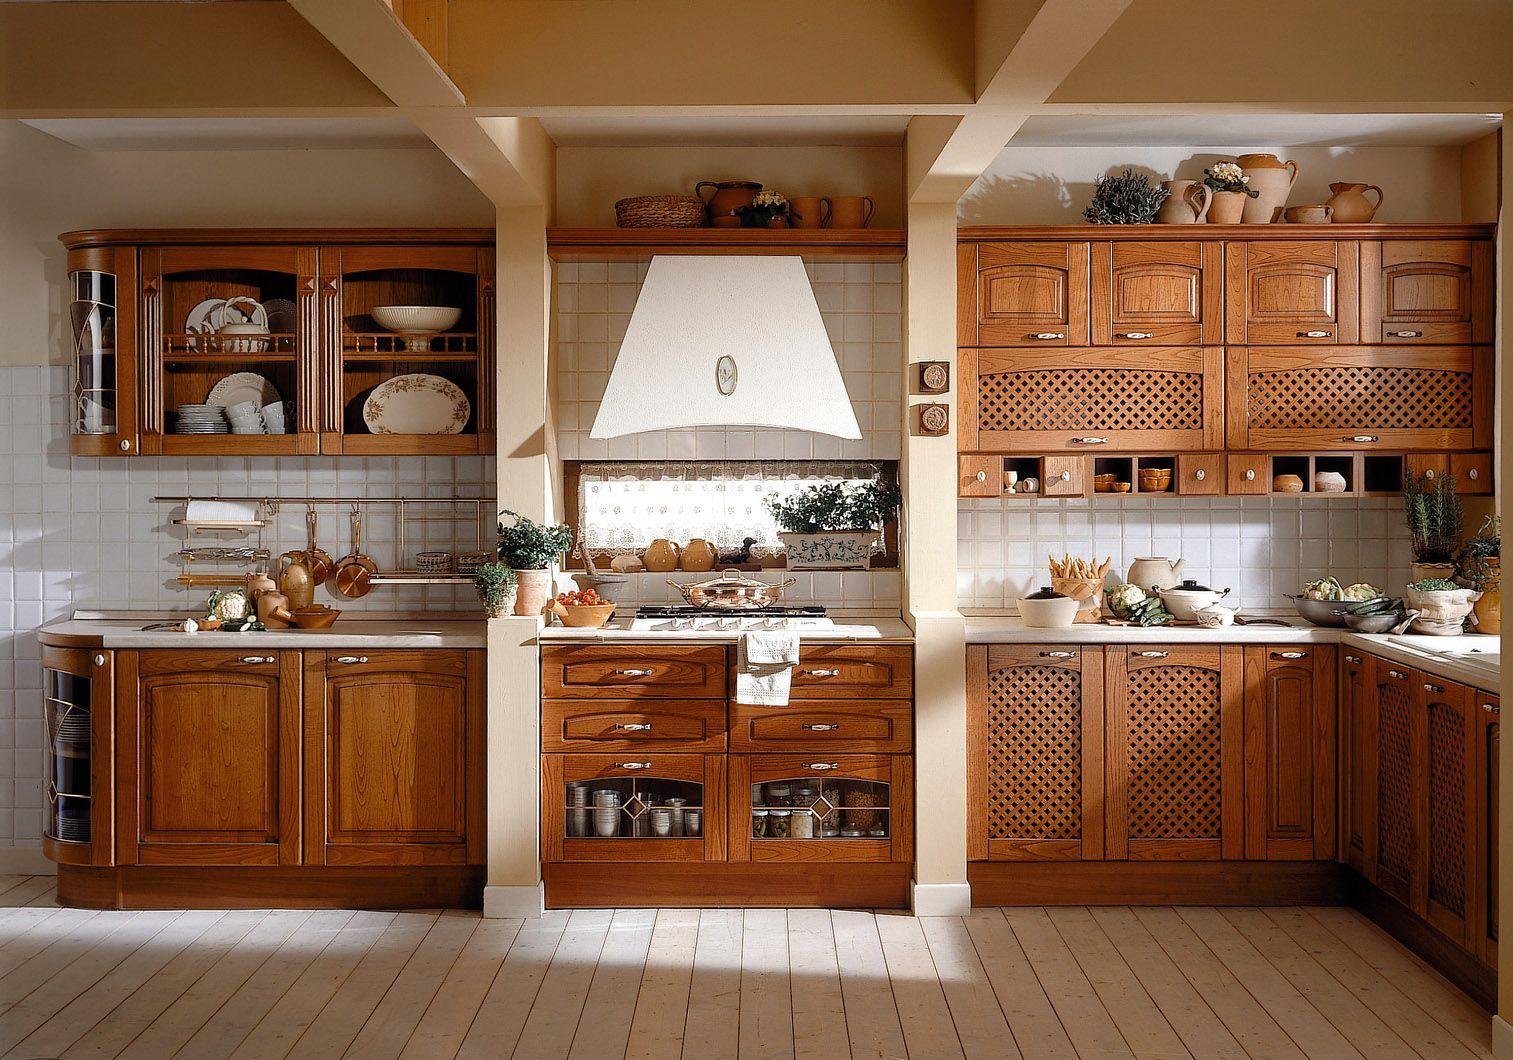 The Greta Collection Aran Italian Kitchens New Kitchen Cabinets Kitchen Cabinet Trends Italian Kitchen Cabinets